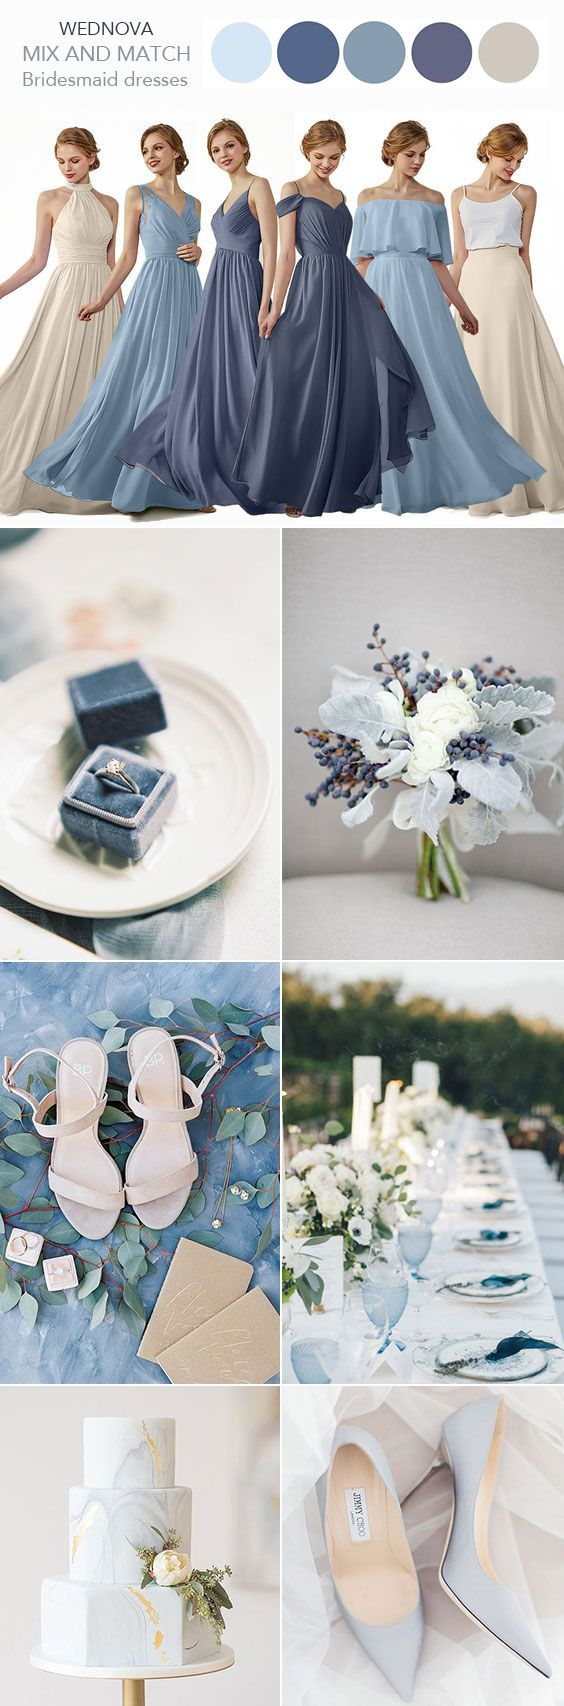 Blue and white wedding decor  Best gray bridesmaid dress v neck dress dusty blue halter white swan